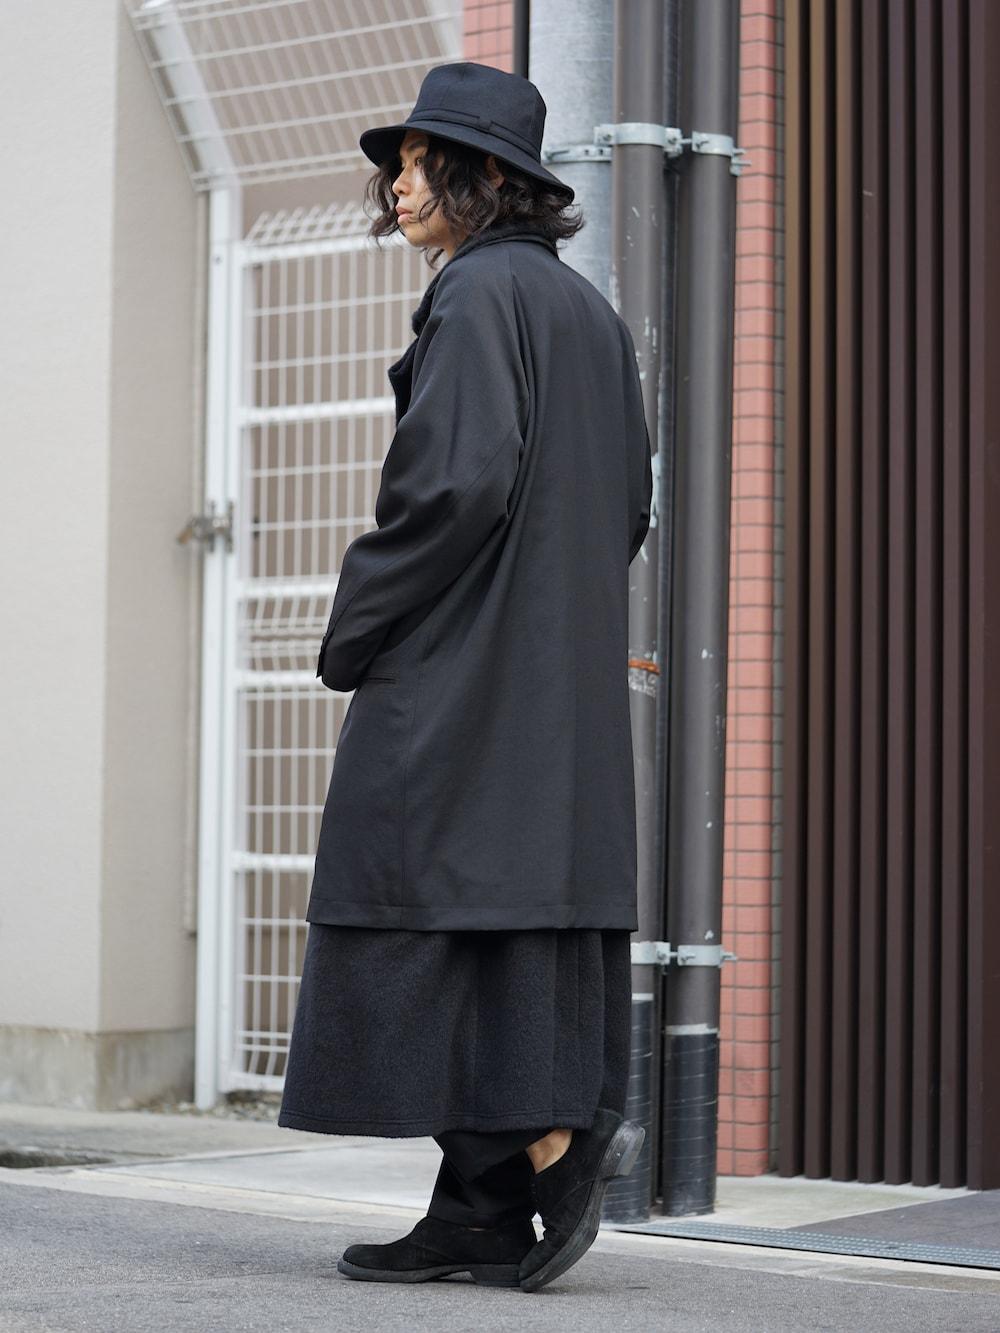 Yohji Yamamoto Coat On Jacket Style 04